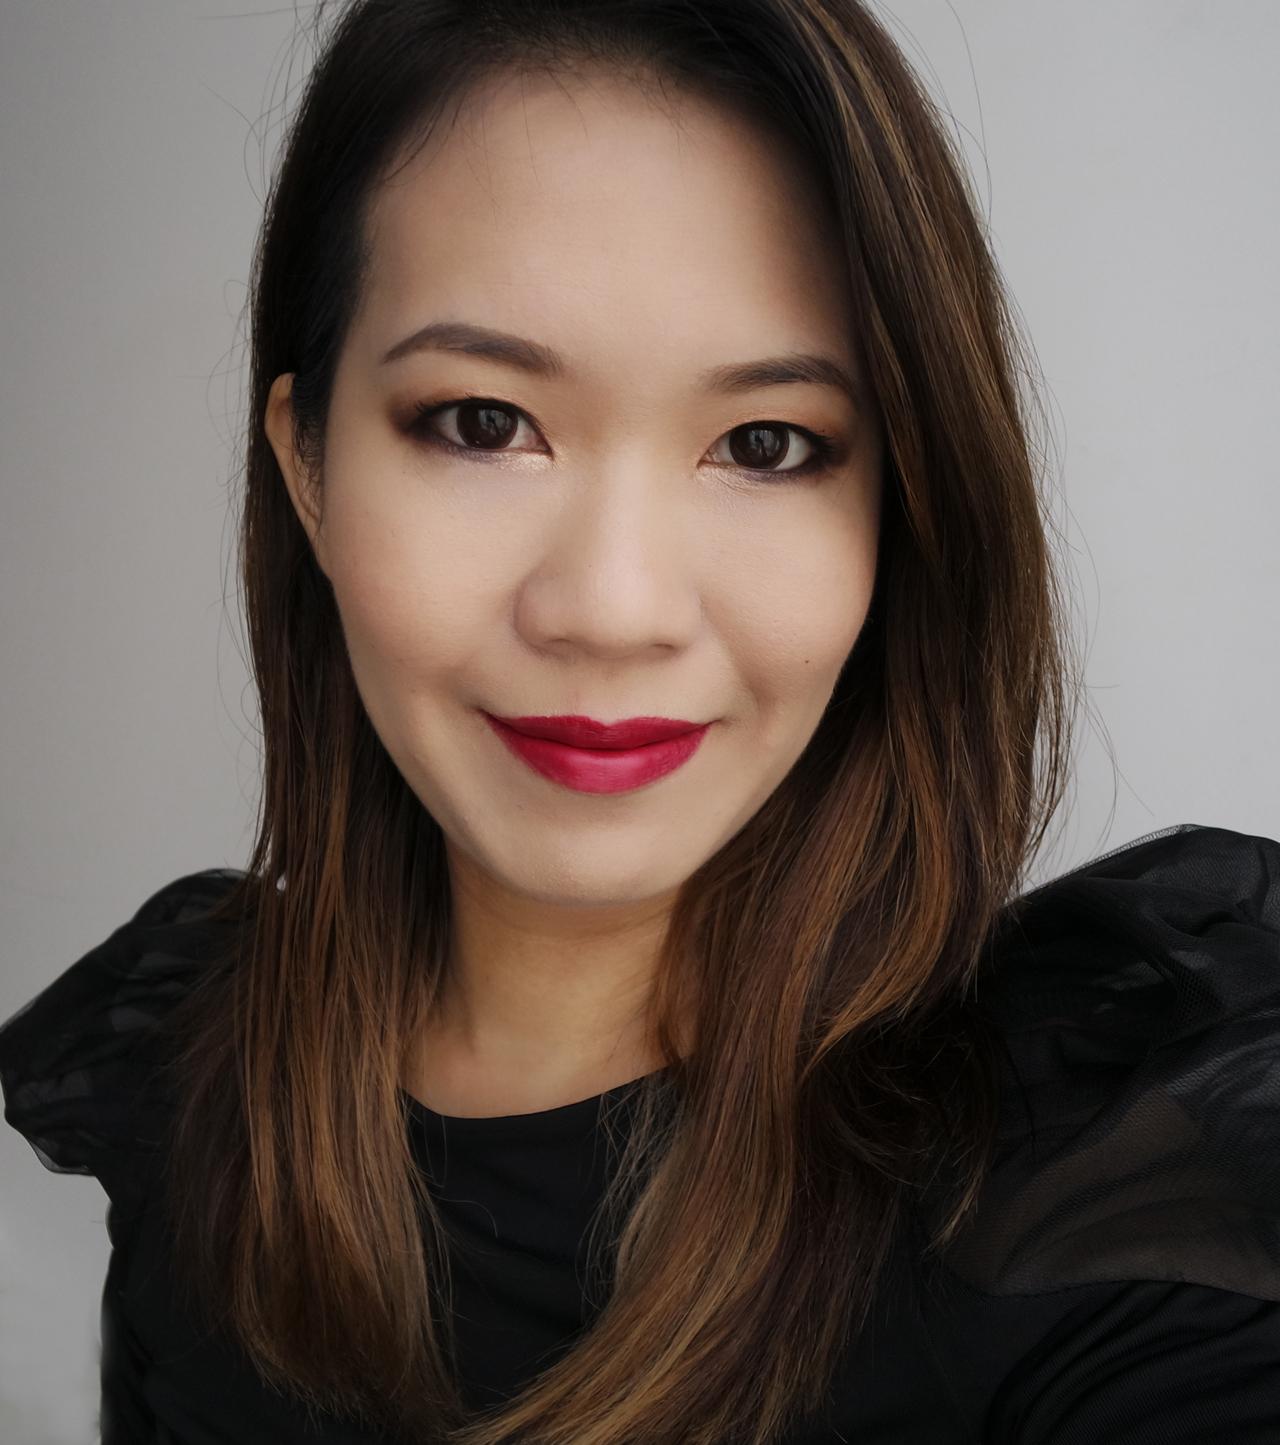 Chanel Rouge Allure Ink 150 Luxuriant makeup look